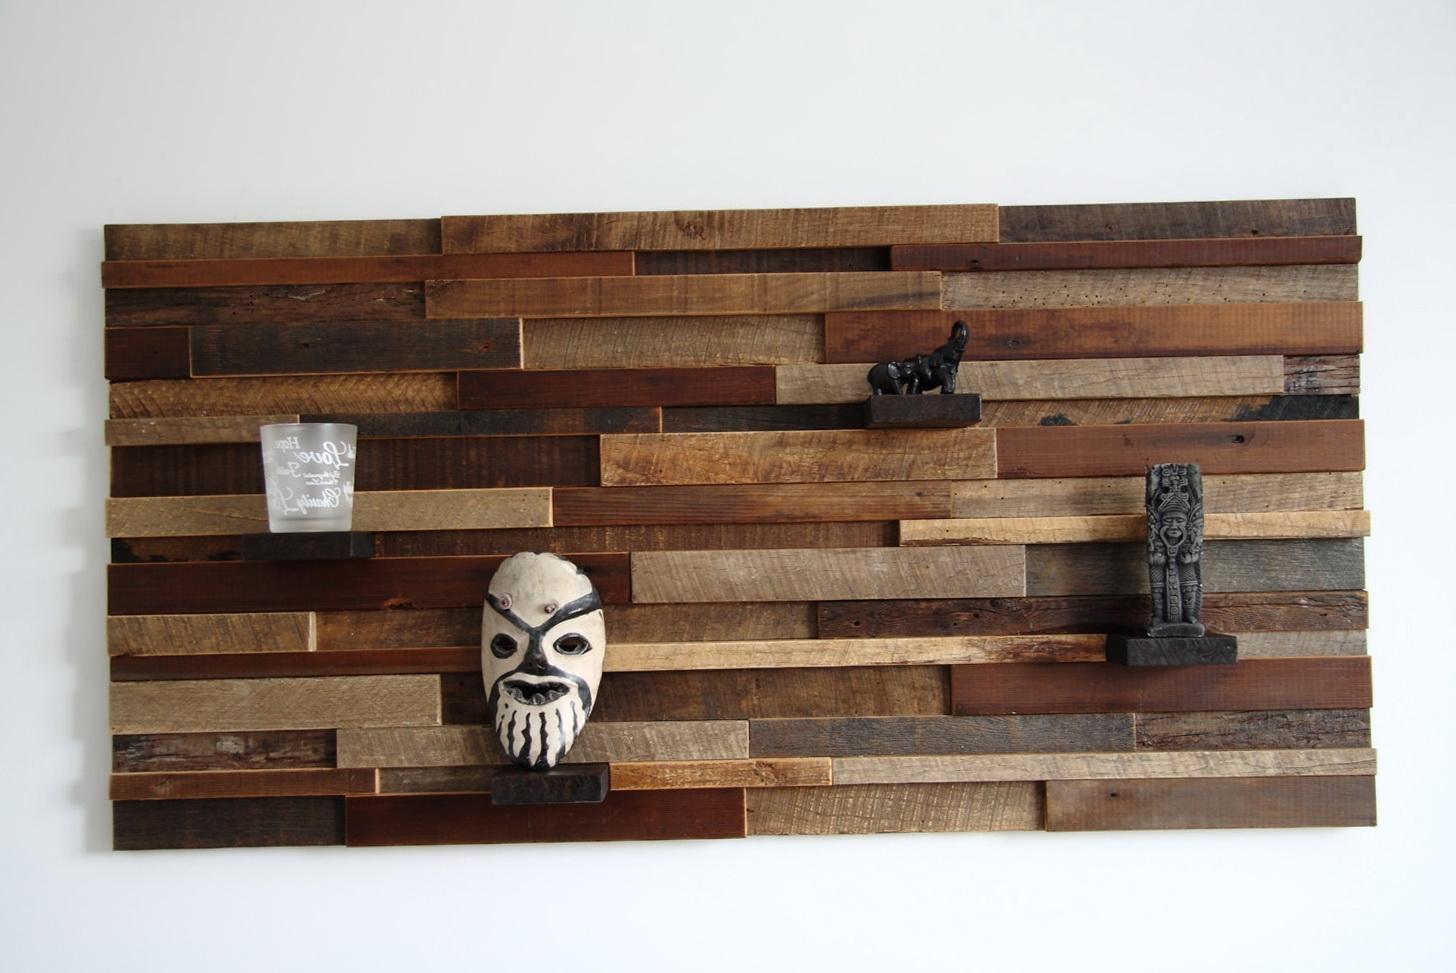 Shelves On Wall Ideas